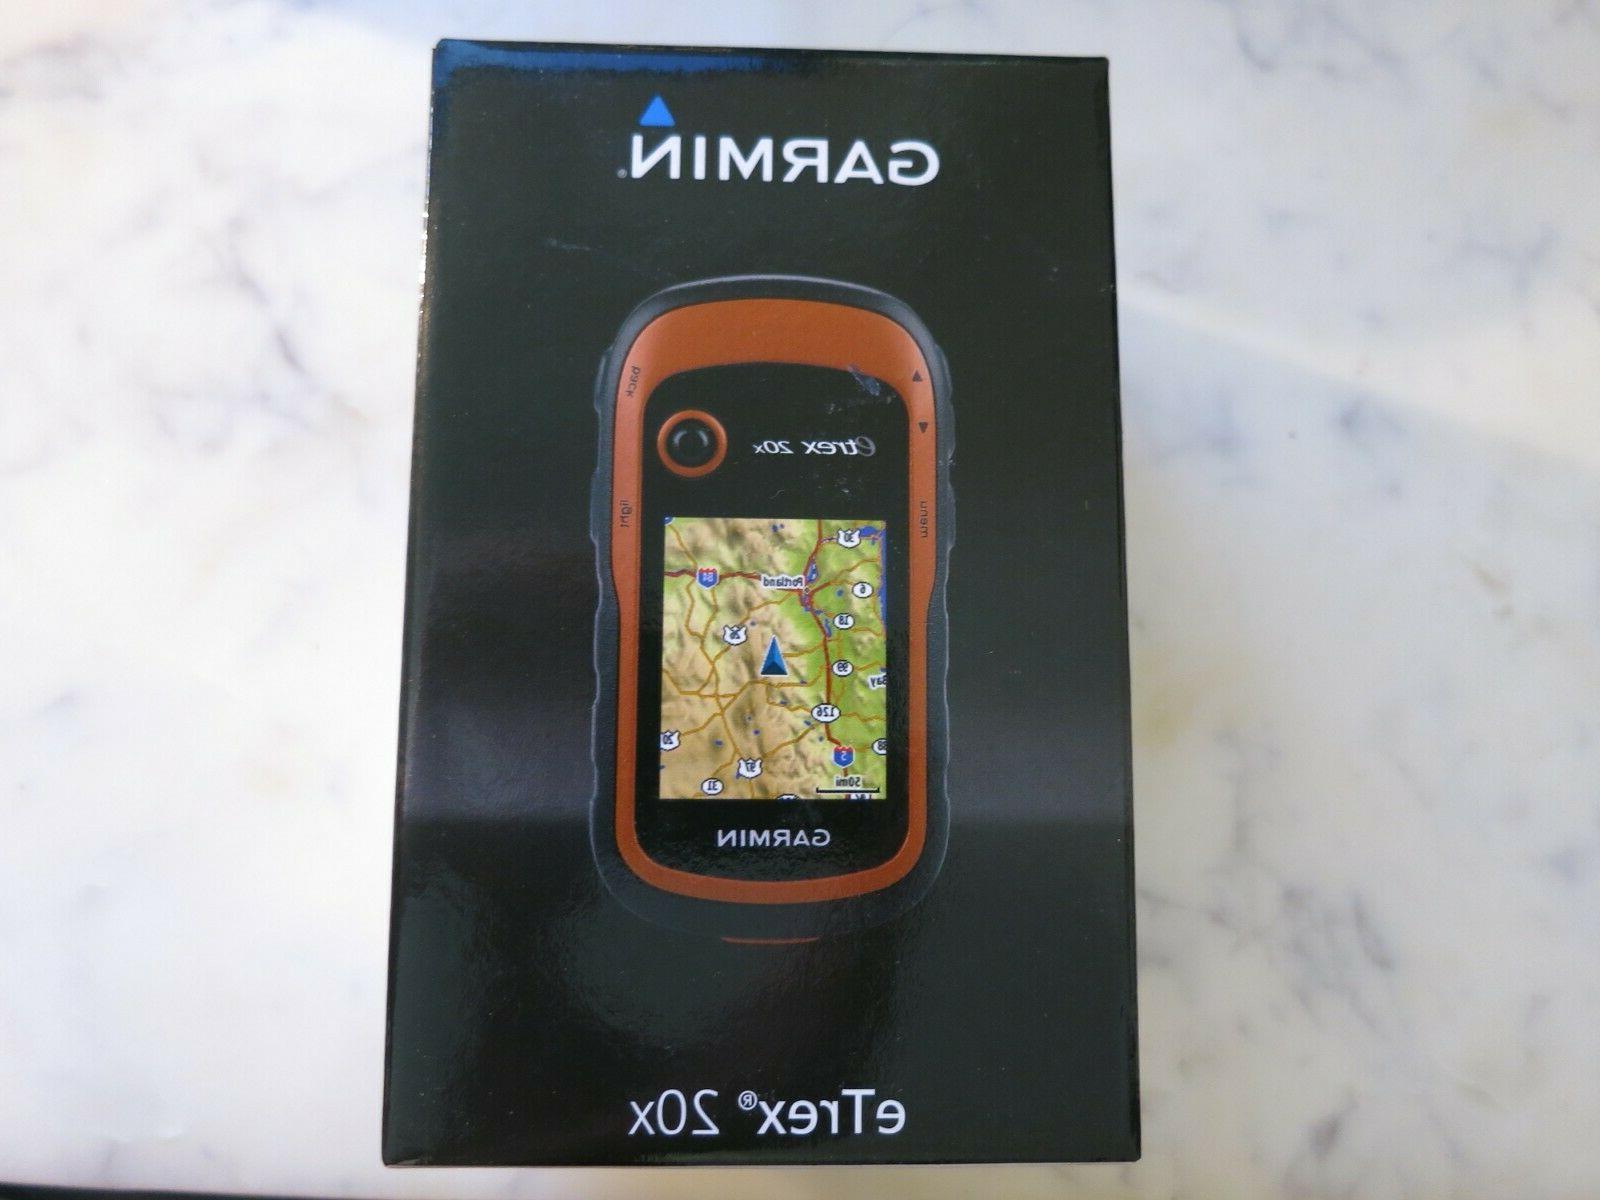 etrex 20x handheld gps 2 2 display